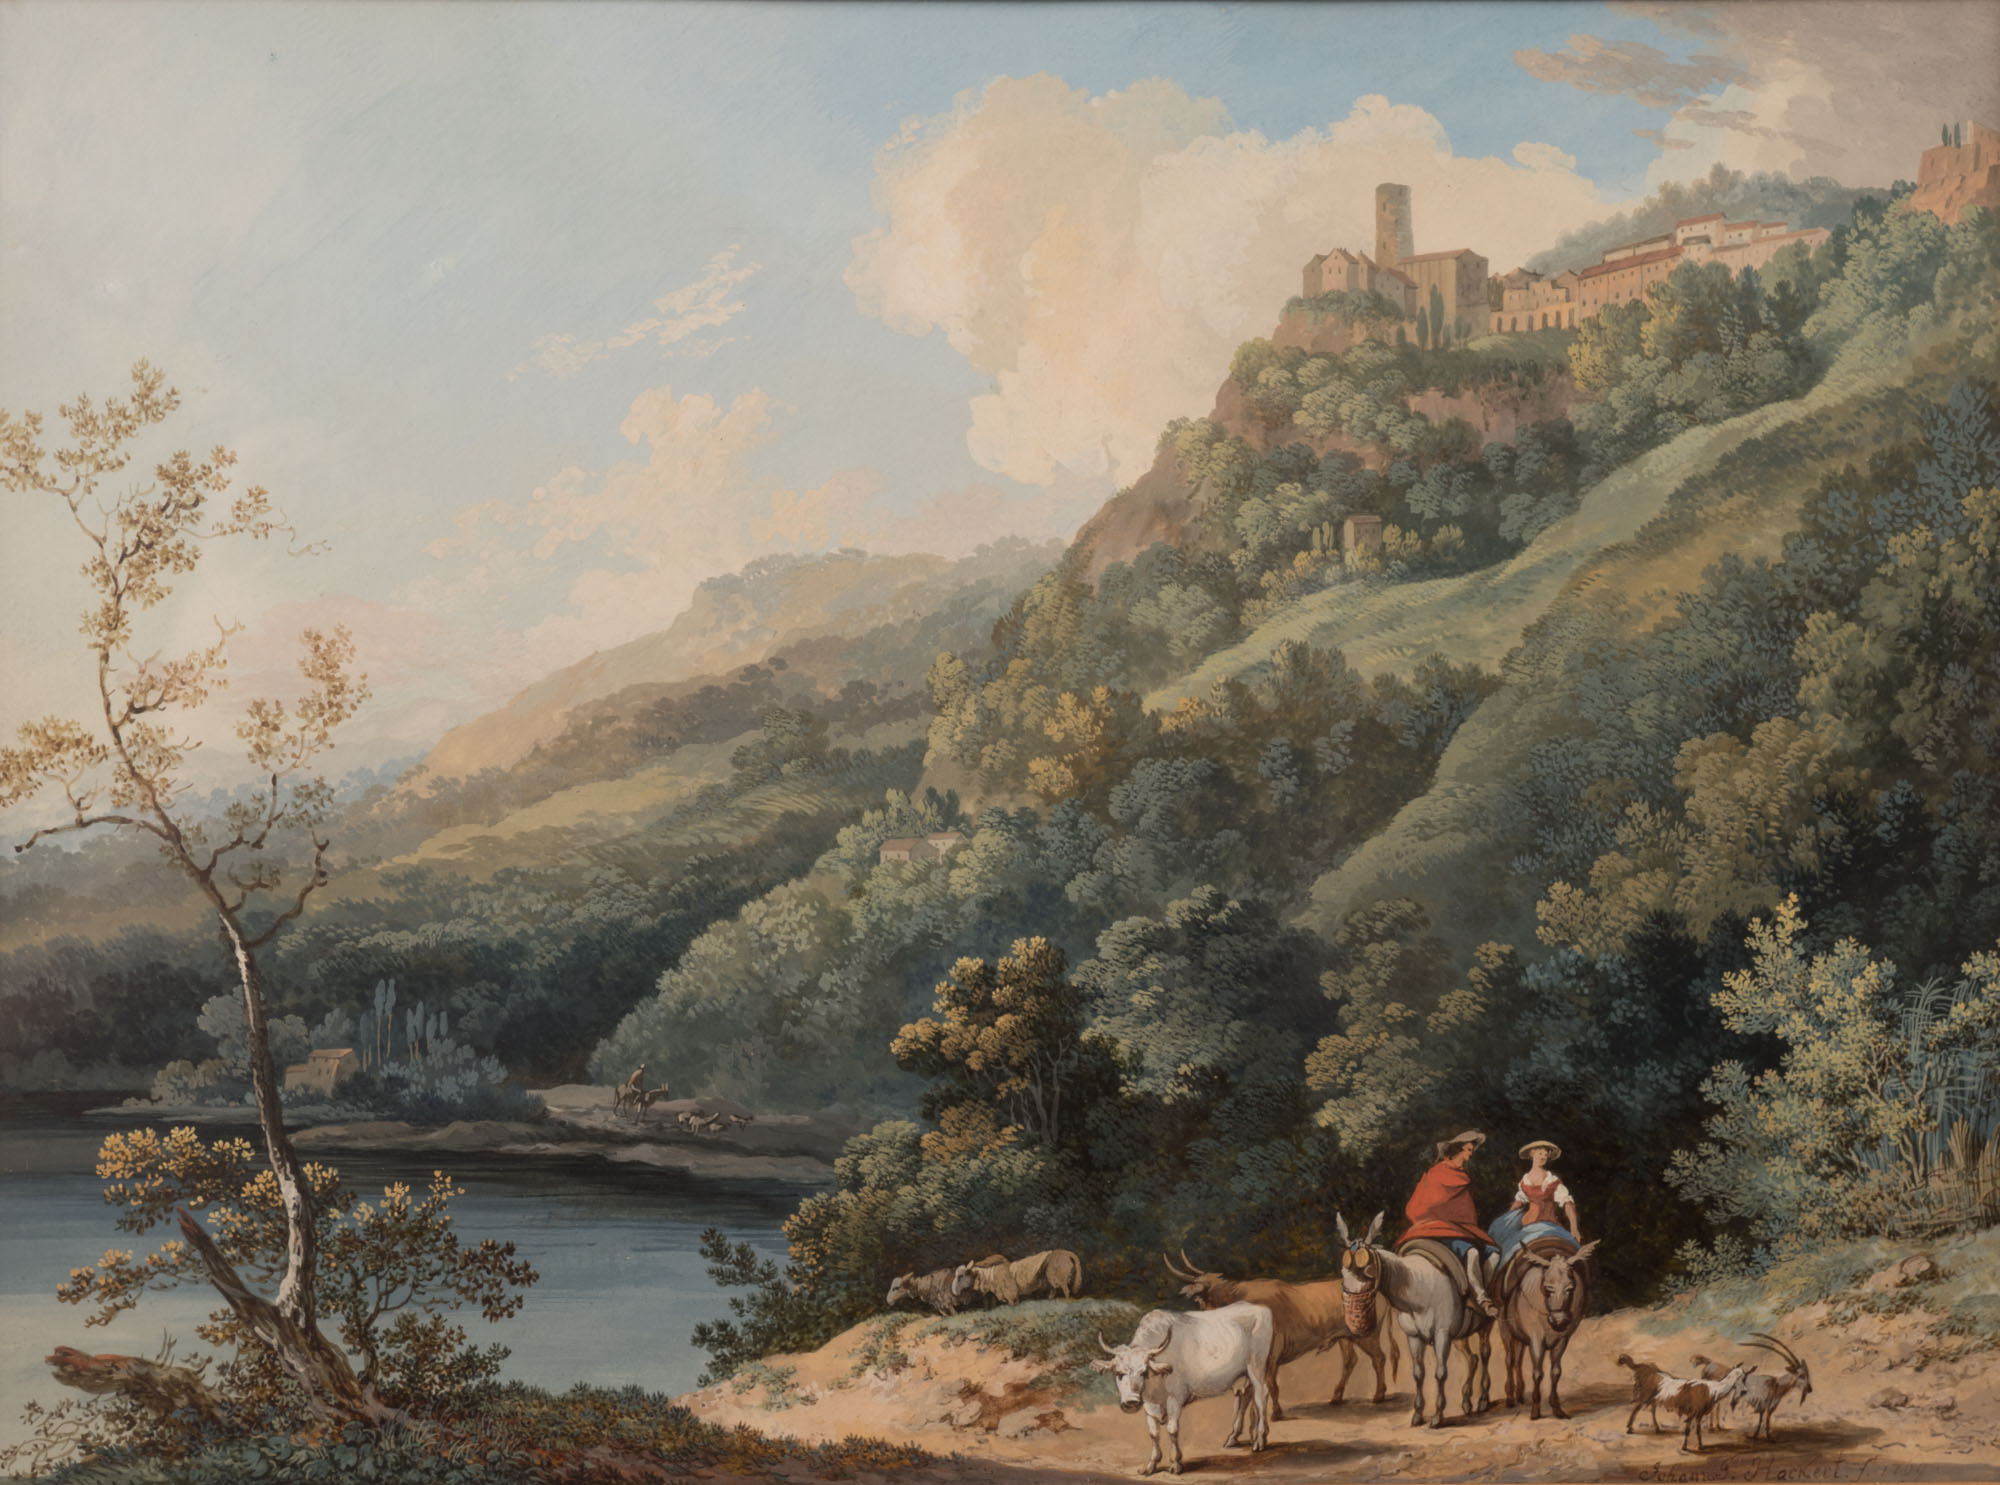 Drovers in a Landscape with a View of Castel Gandolfo, by Johann-Gottlieb Hackert (1744-1773).